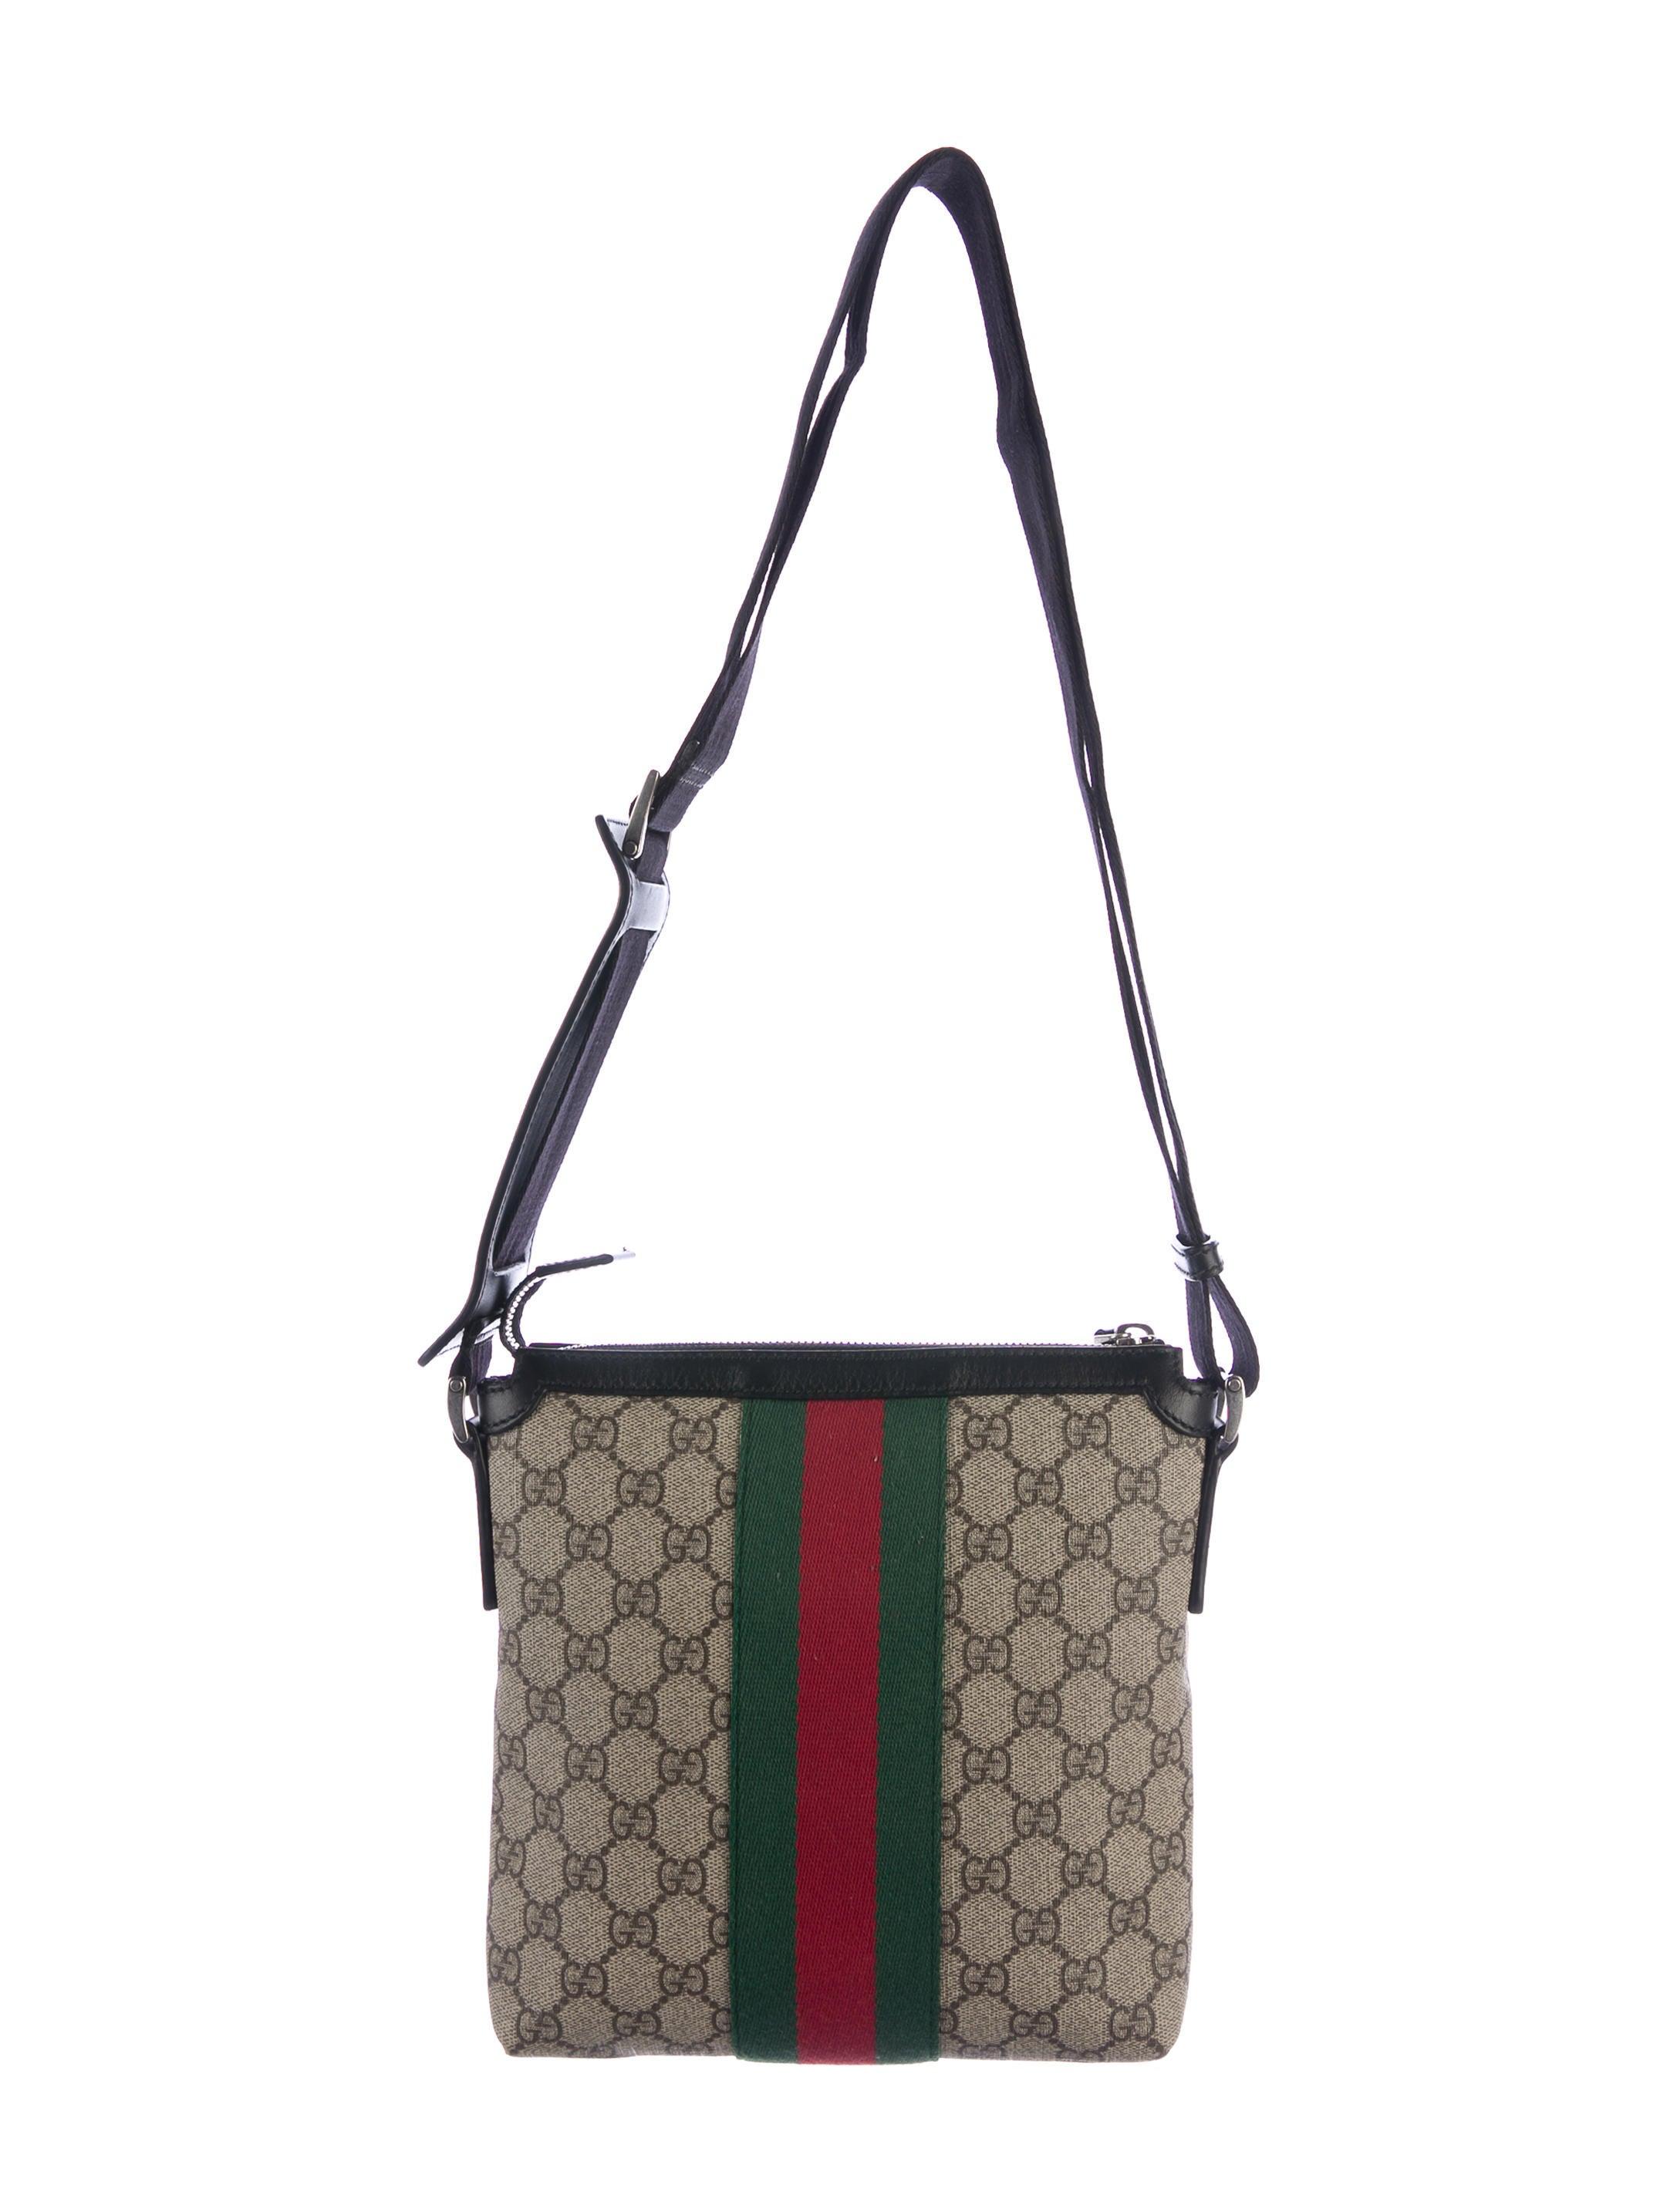 Gucci Web Gg Supreme Flat Messenger Bag Bags Guc162009